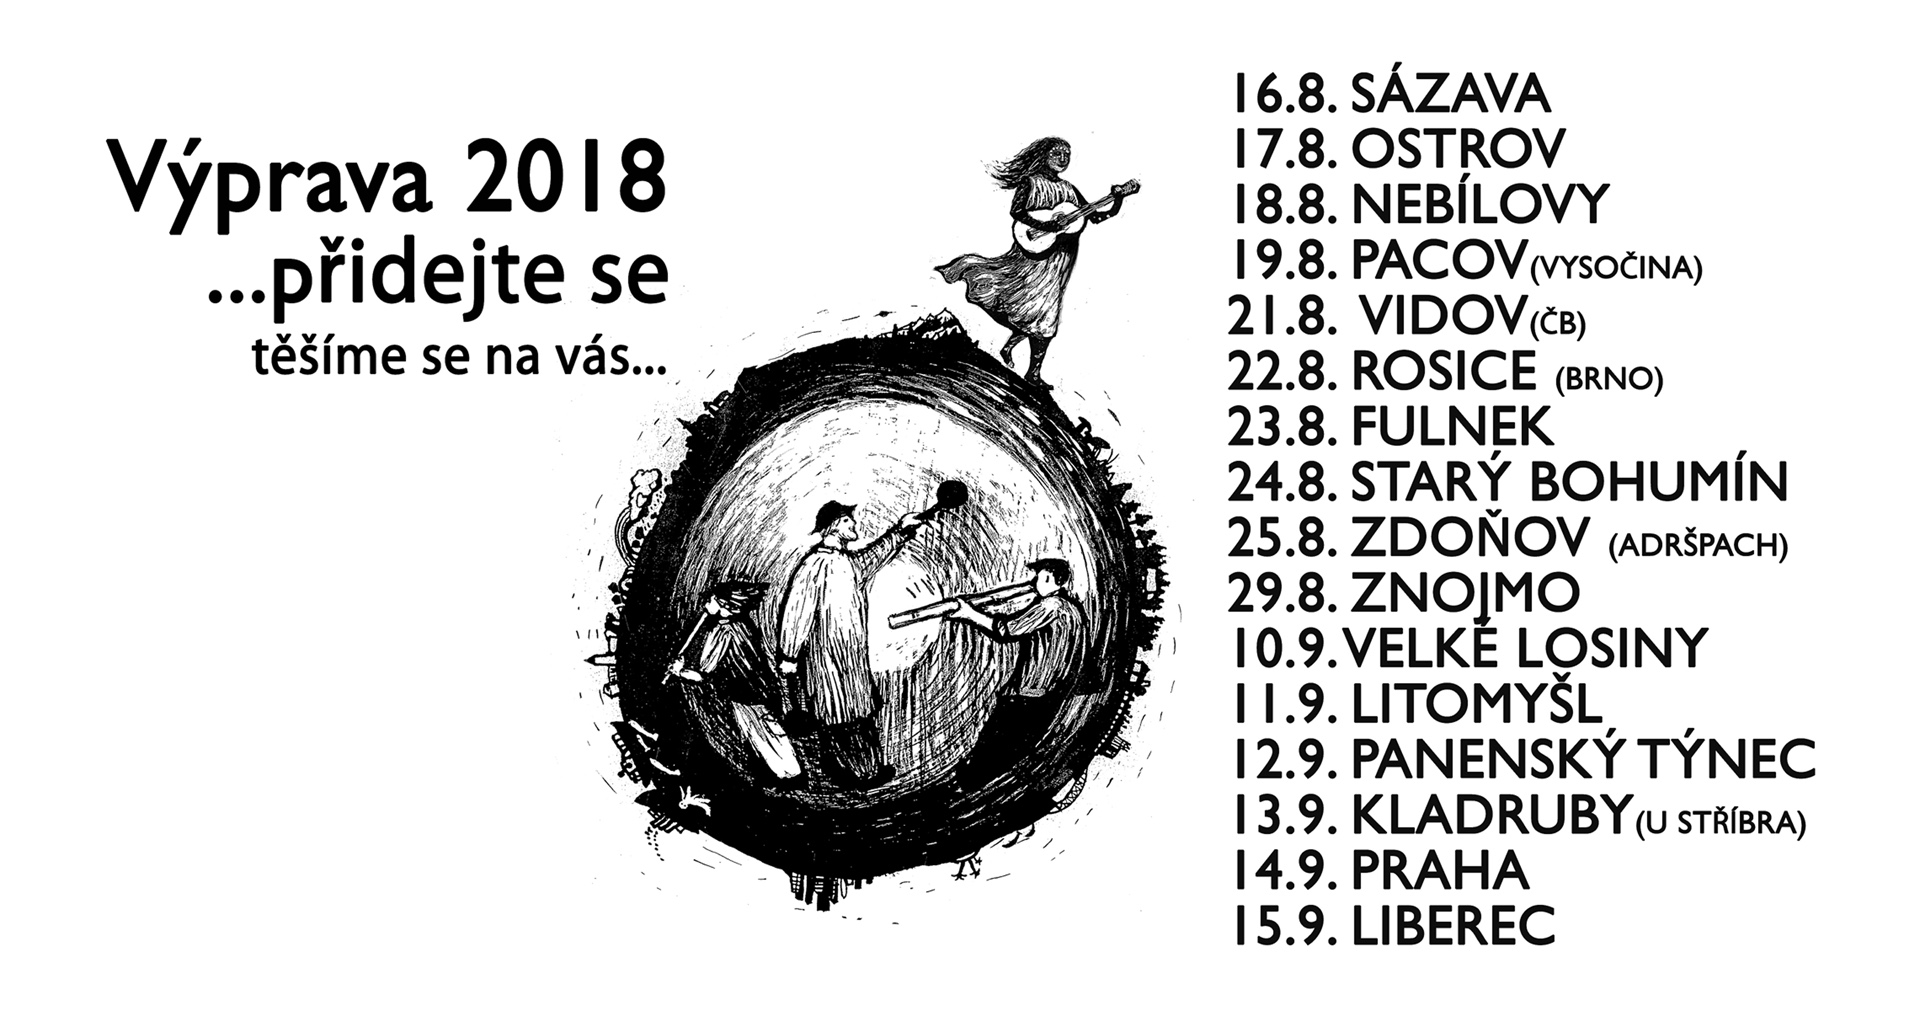 Výprava 2018